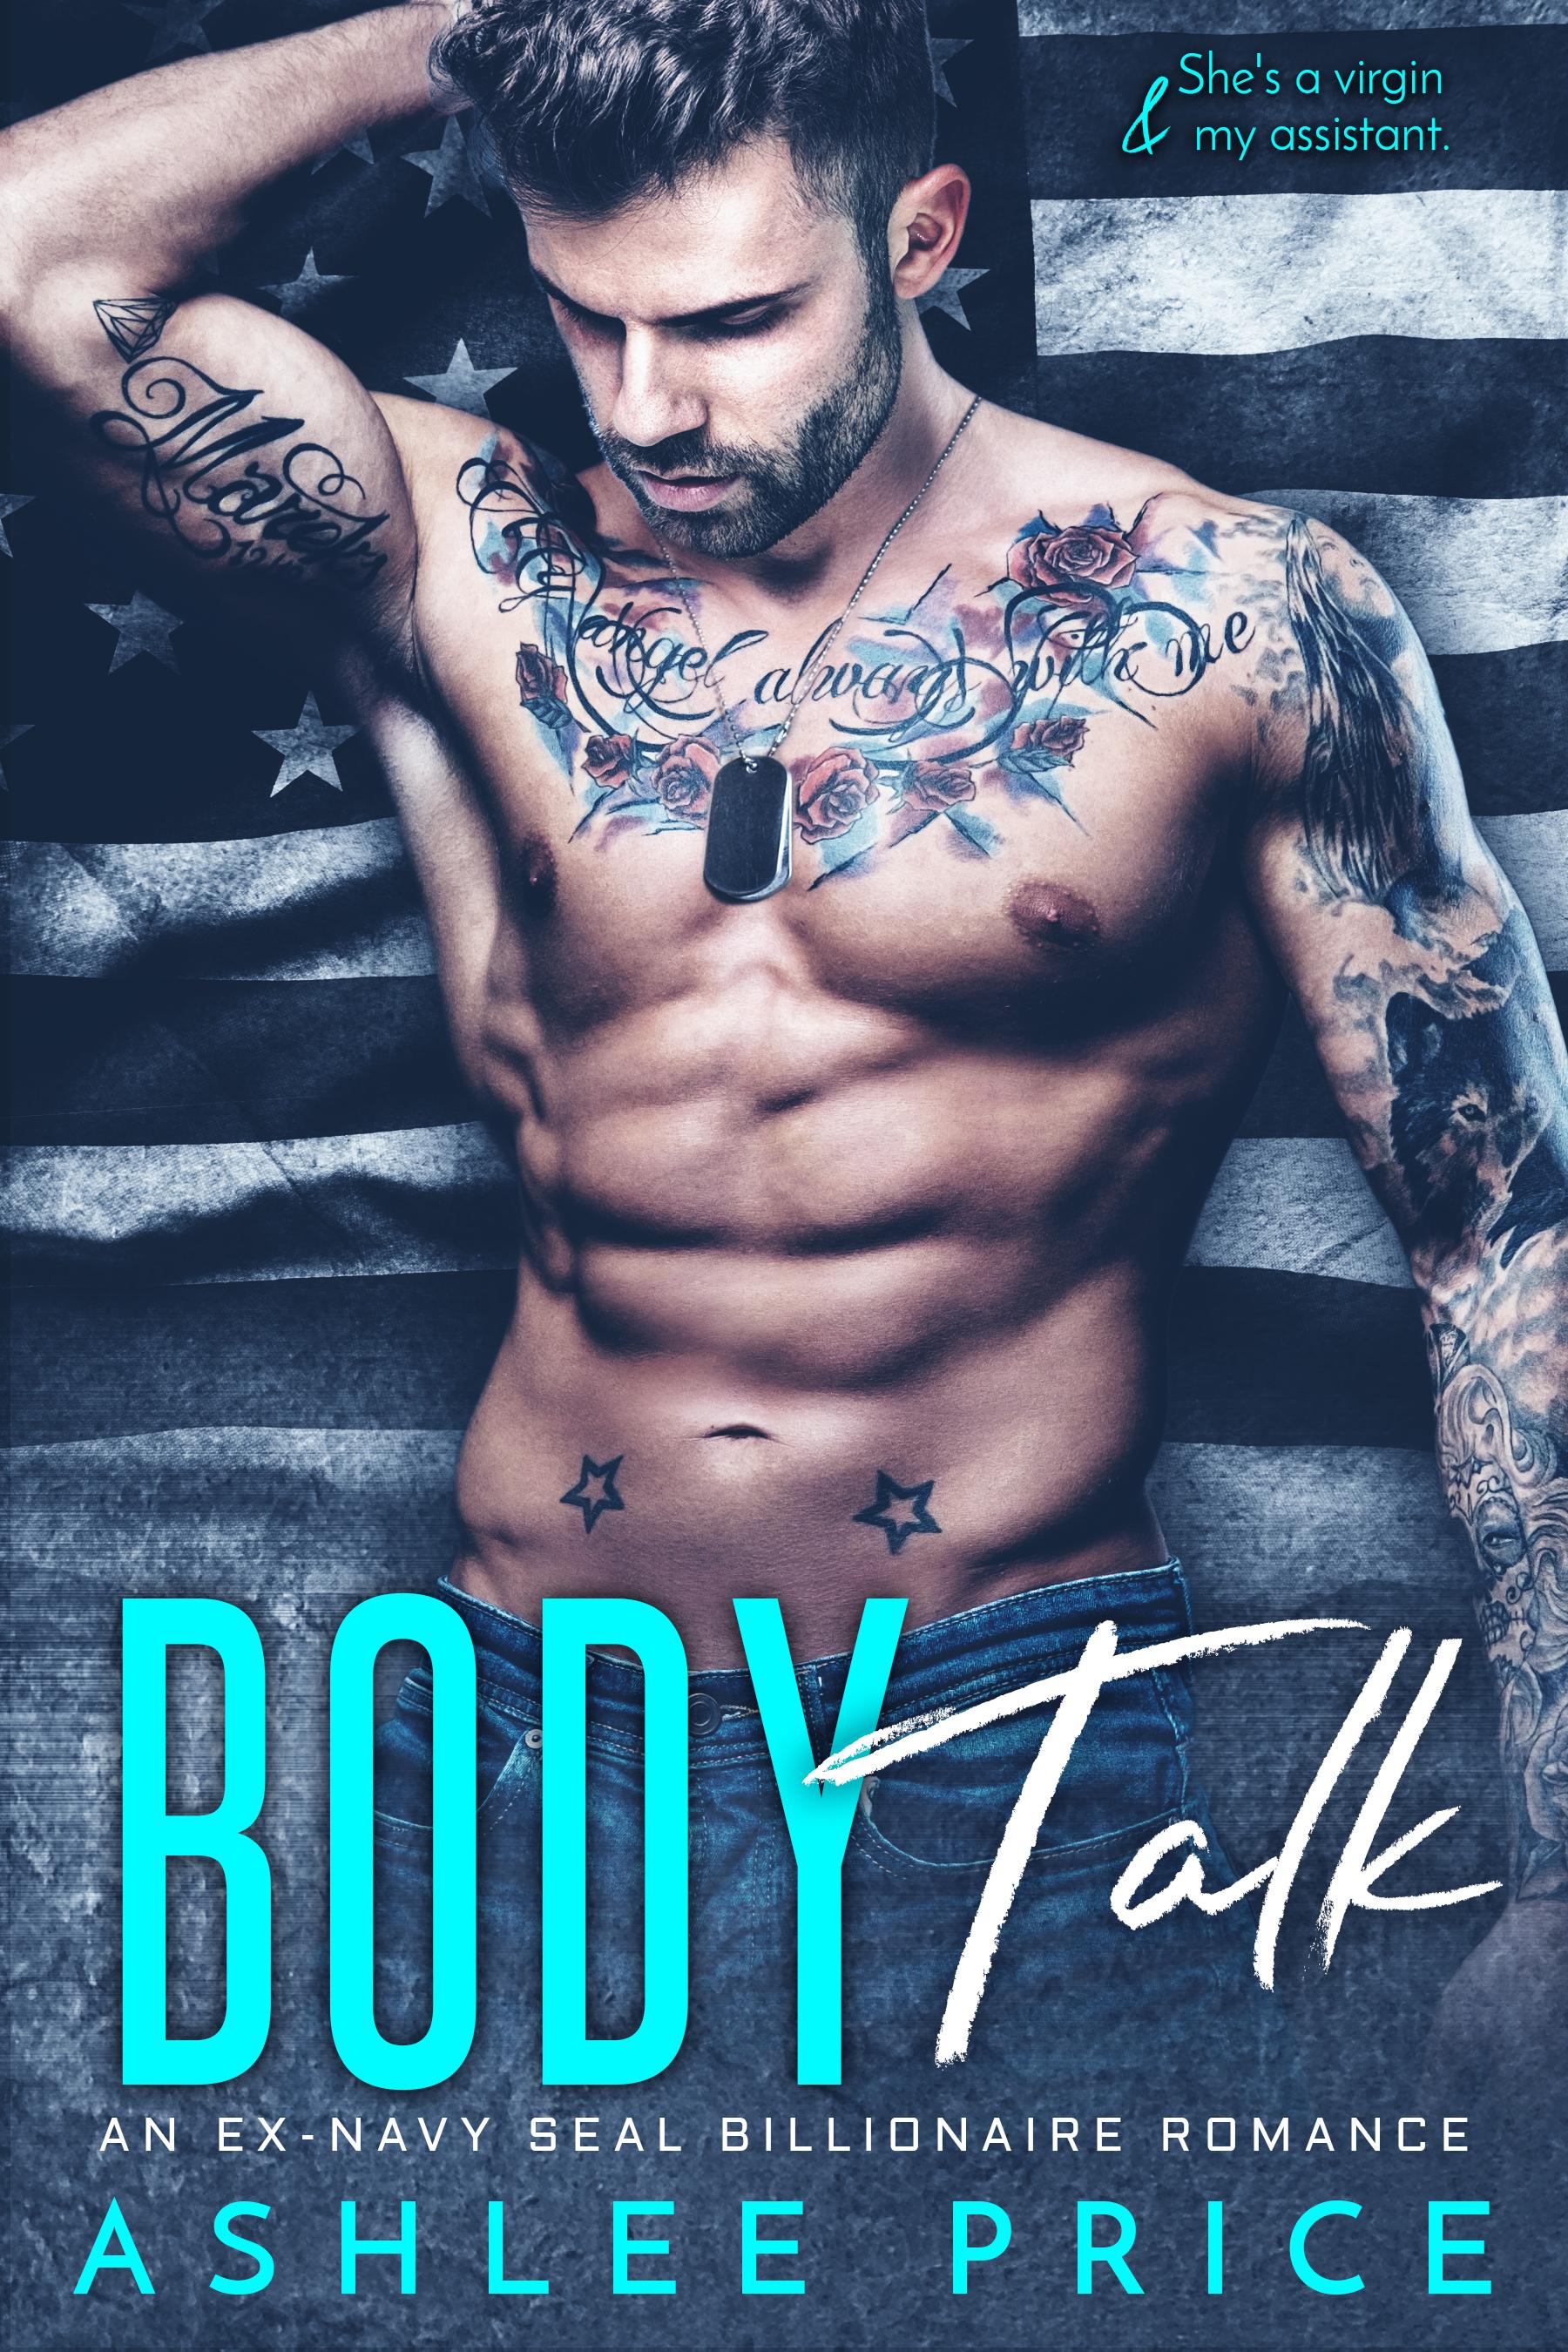 Option 2_Body Talk.jpg